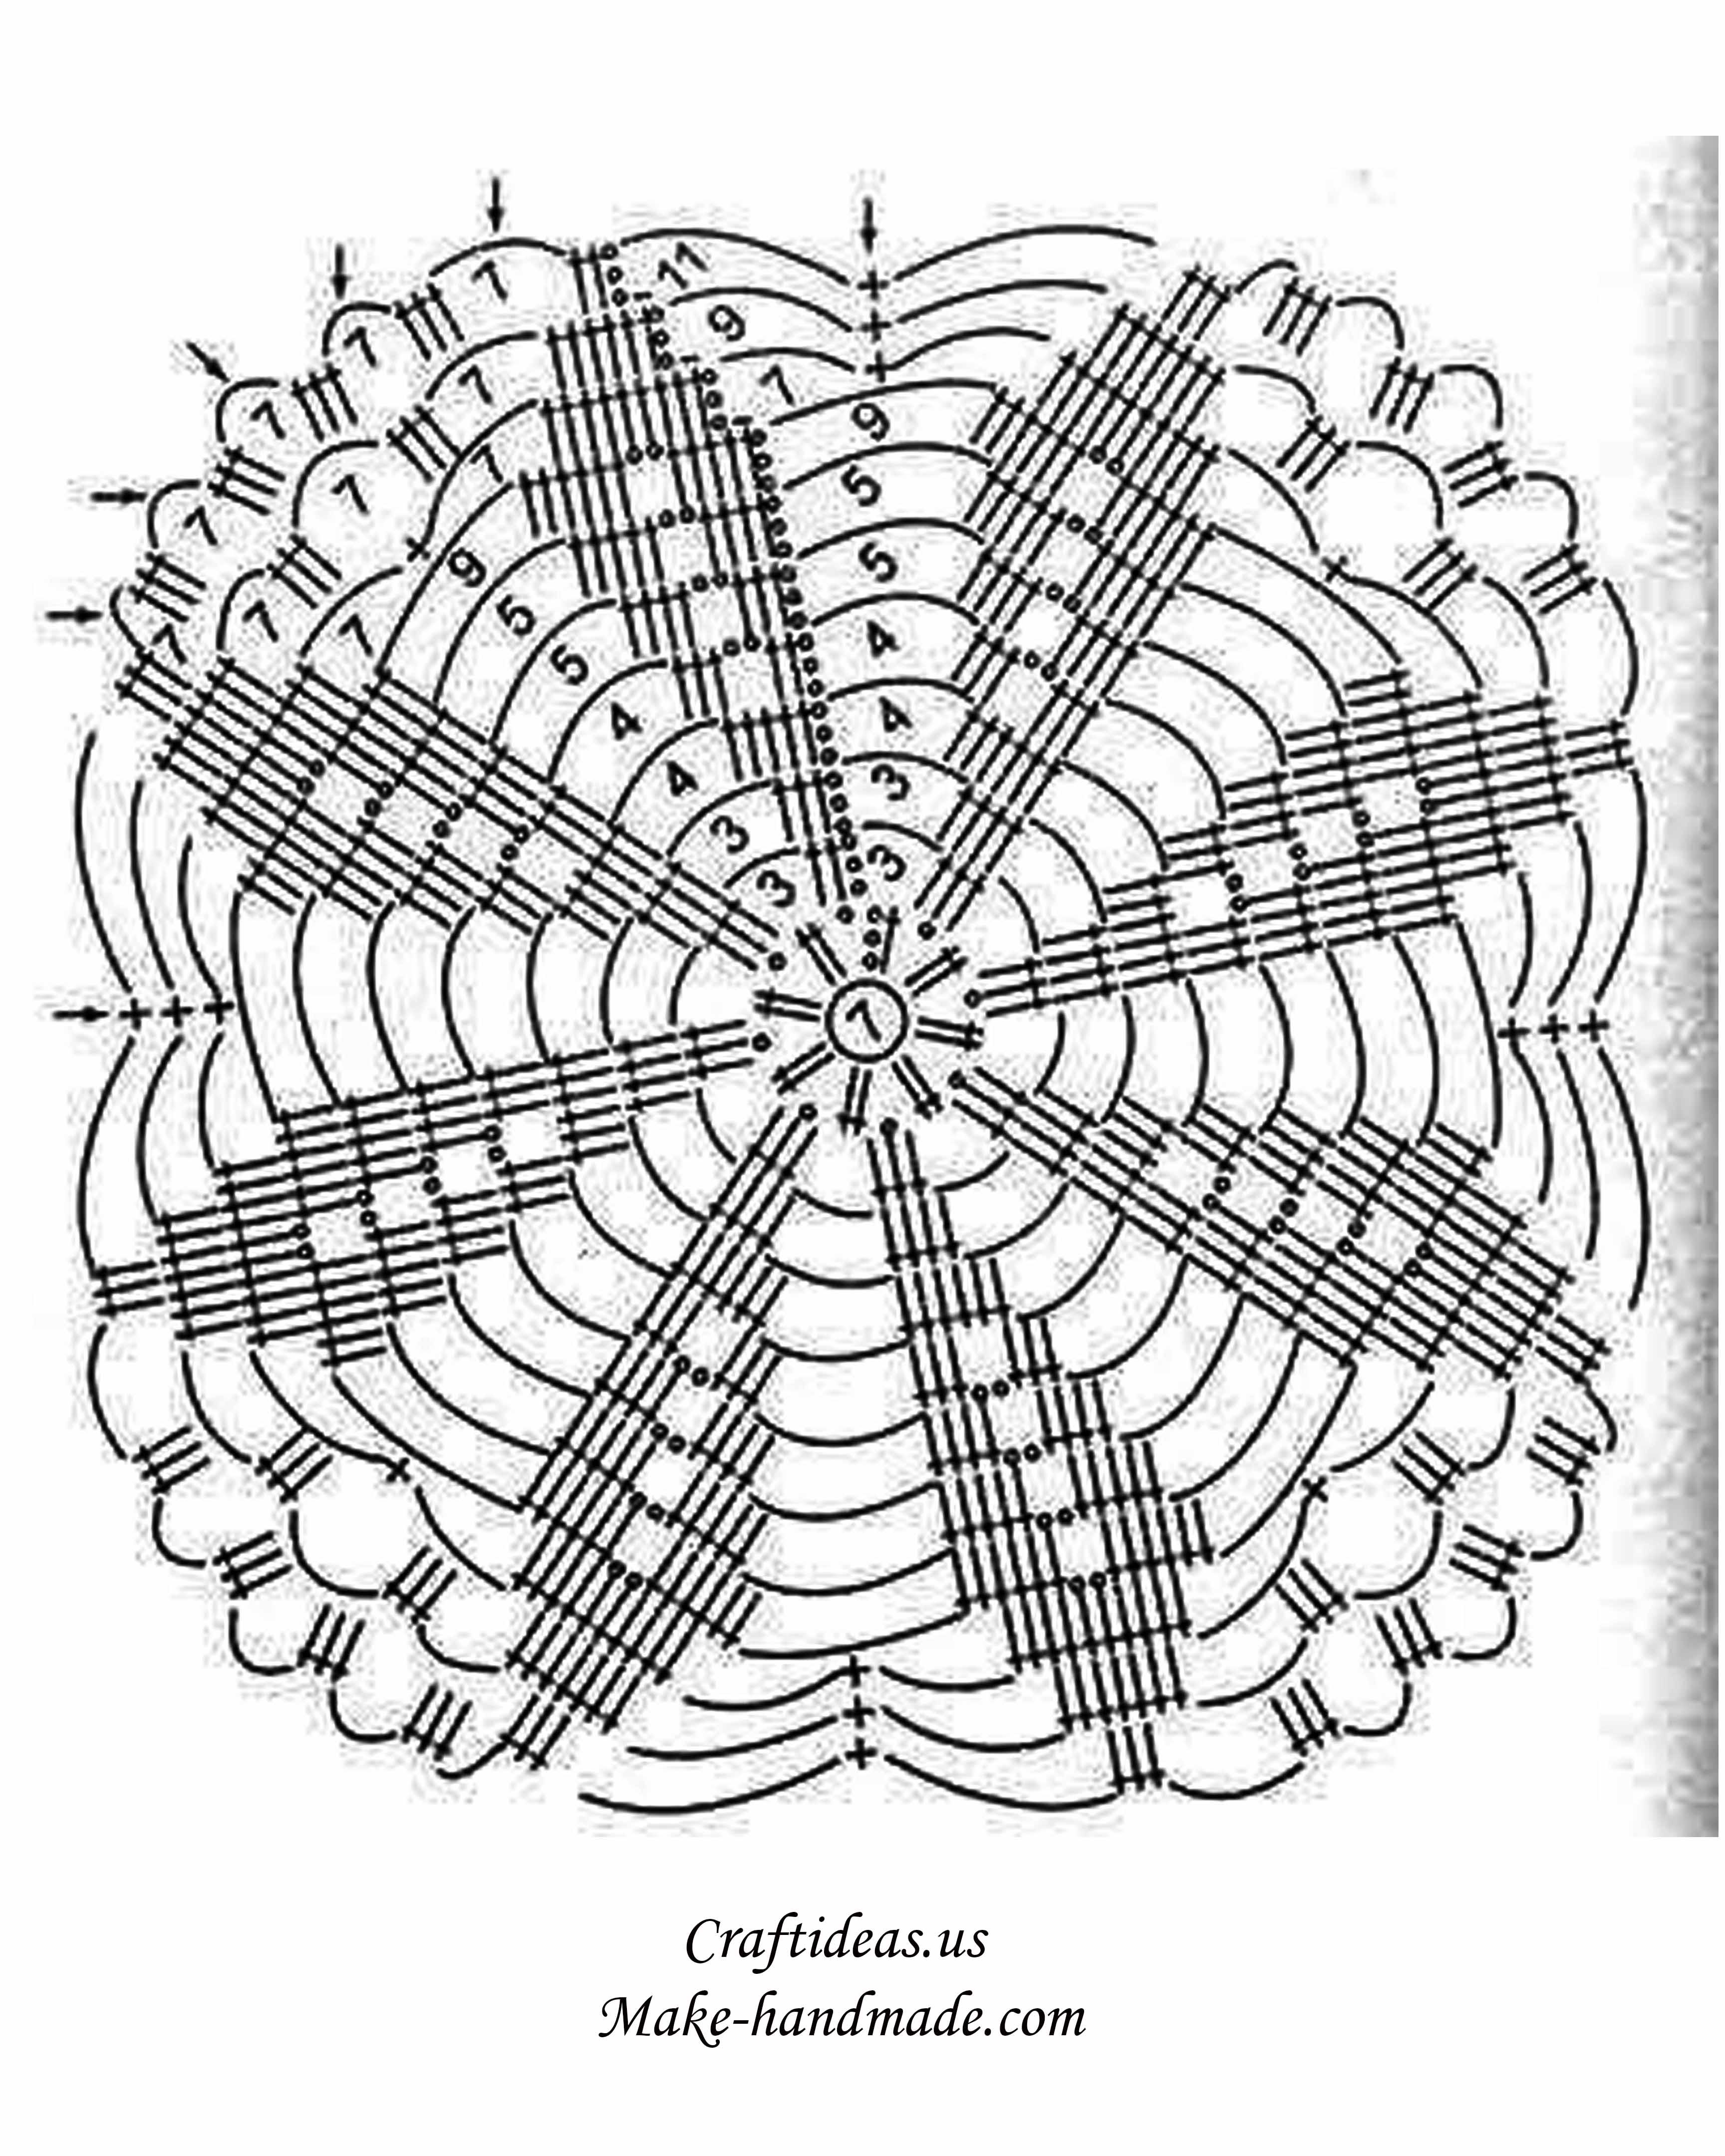 Crochet Shawls Craft Ideas Snowflakescrochetpatterndiagram Snowflakes Poncho Chart